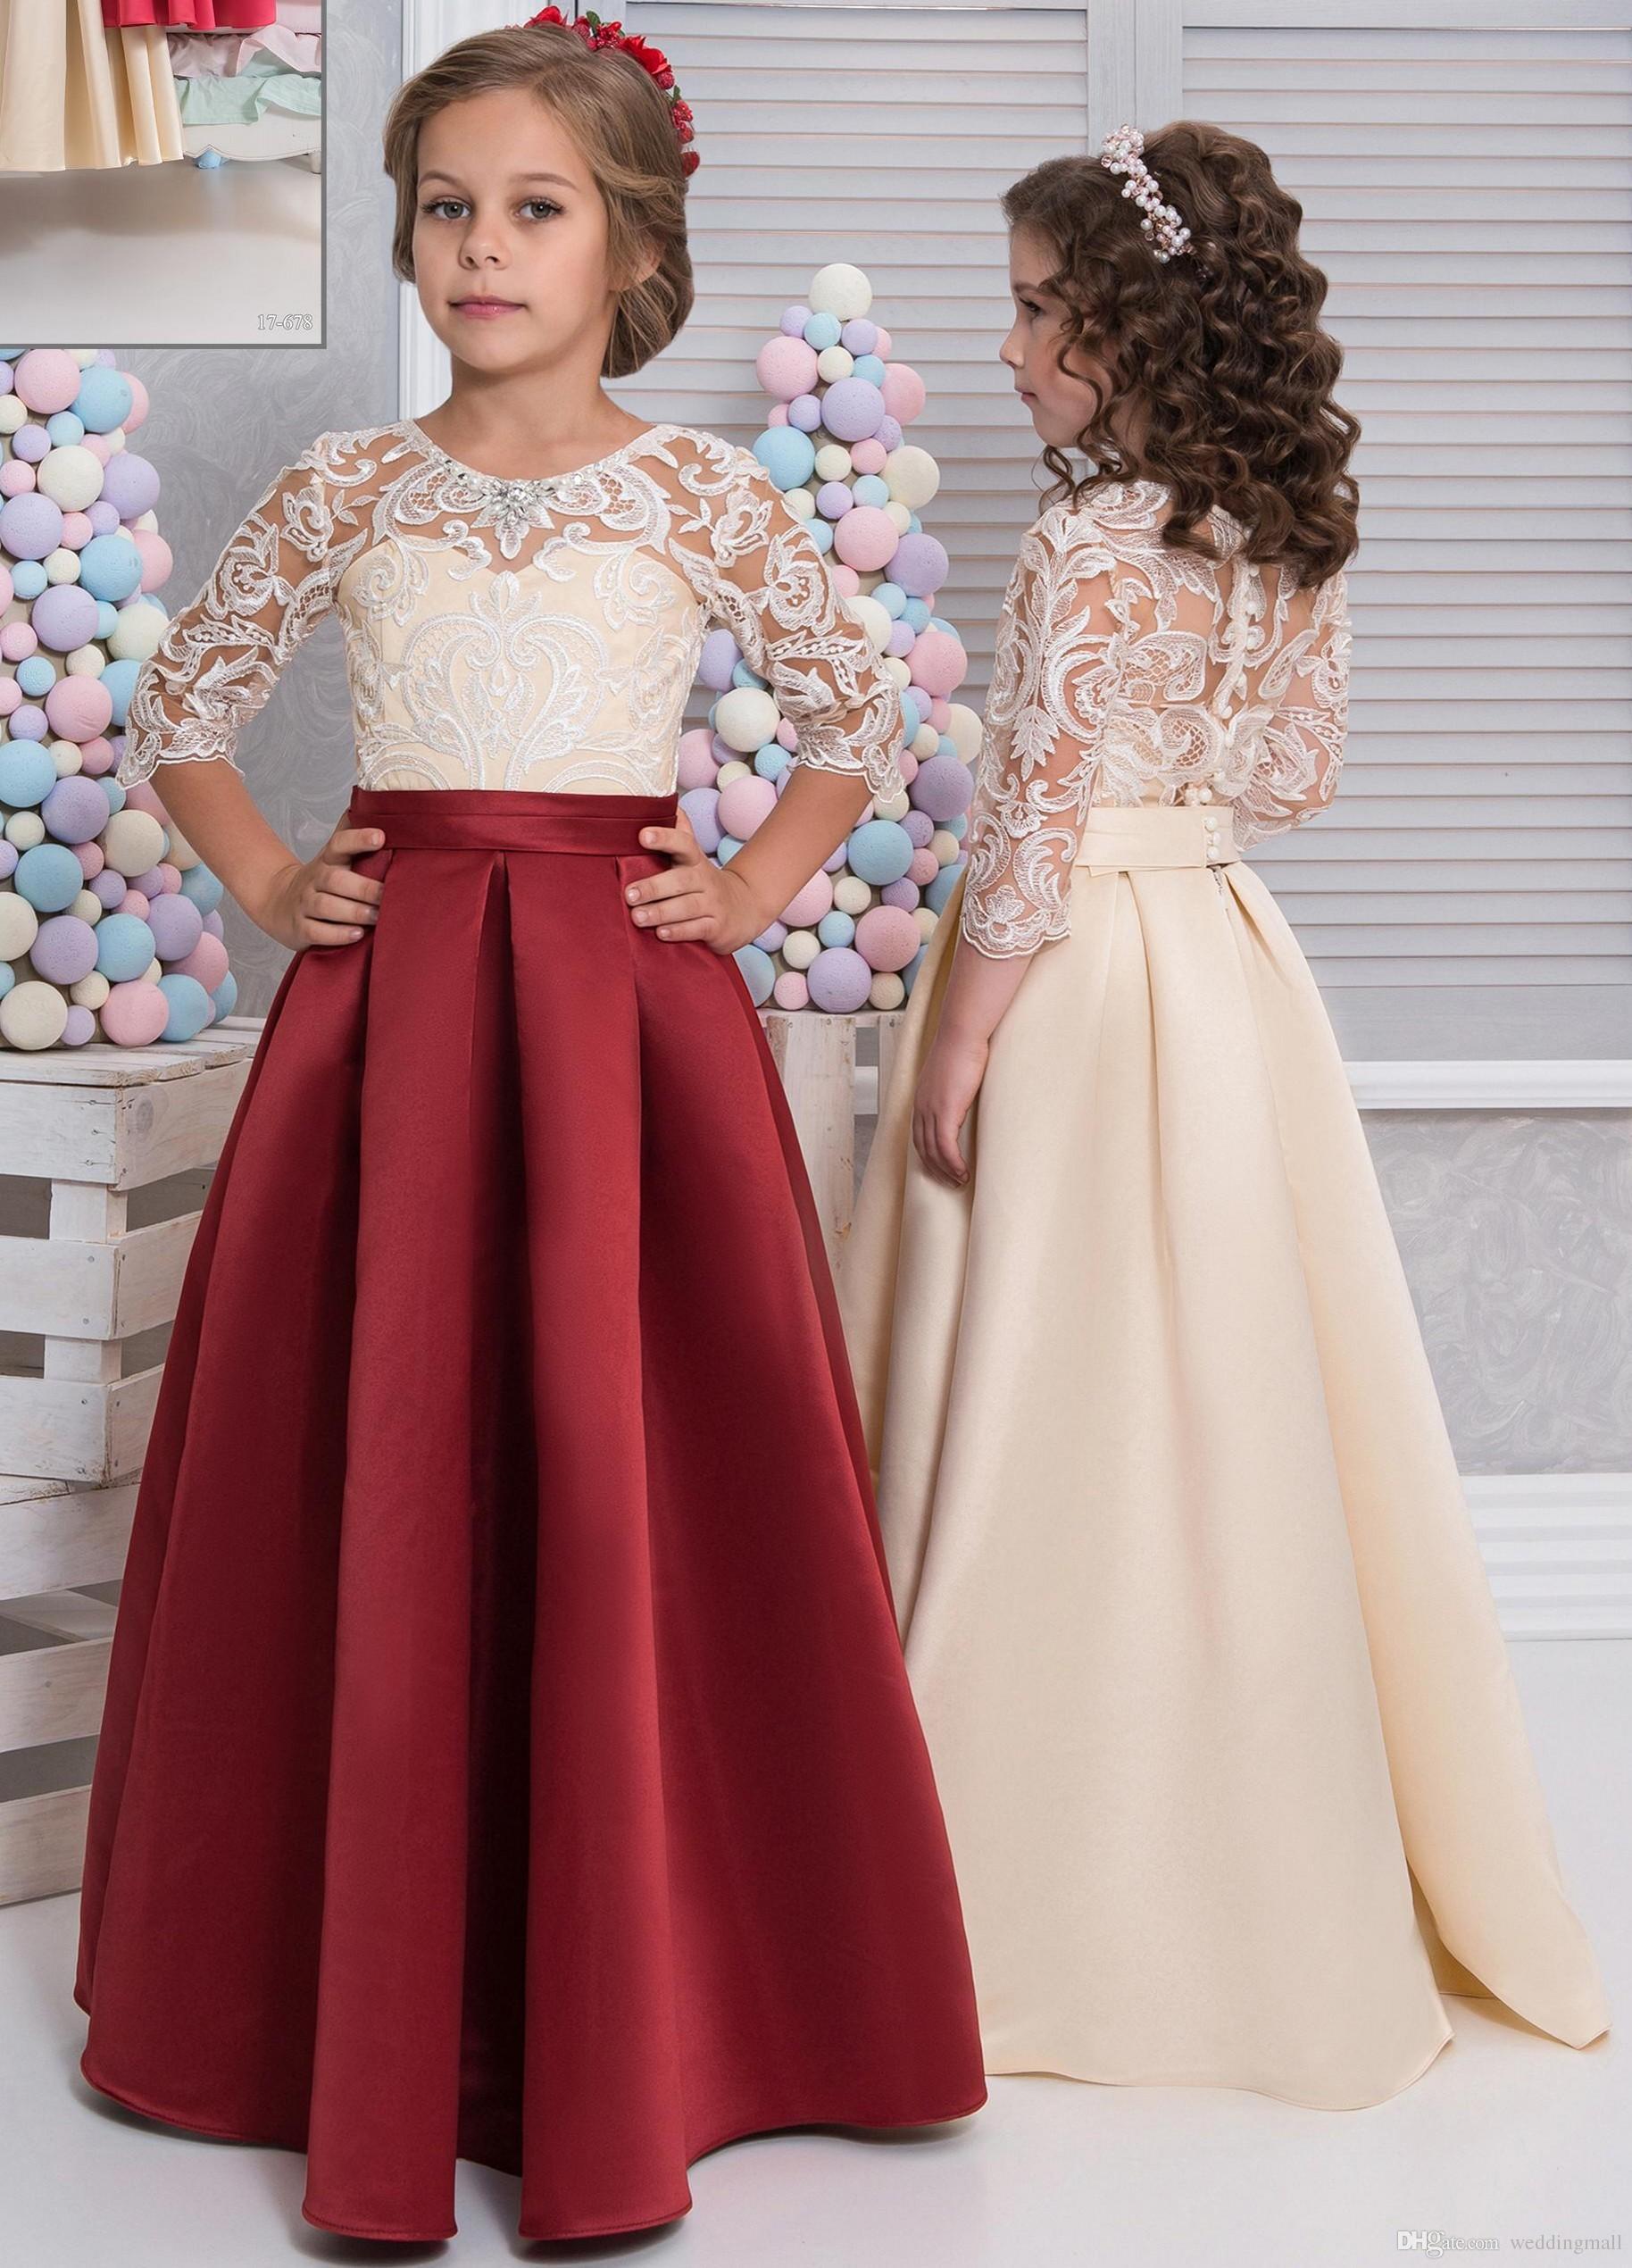 New wedding dresses girl wedding new wedding dresses girl junglespirit Gallery